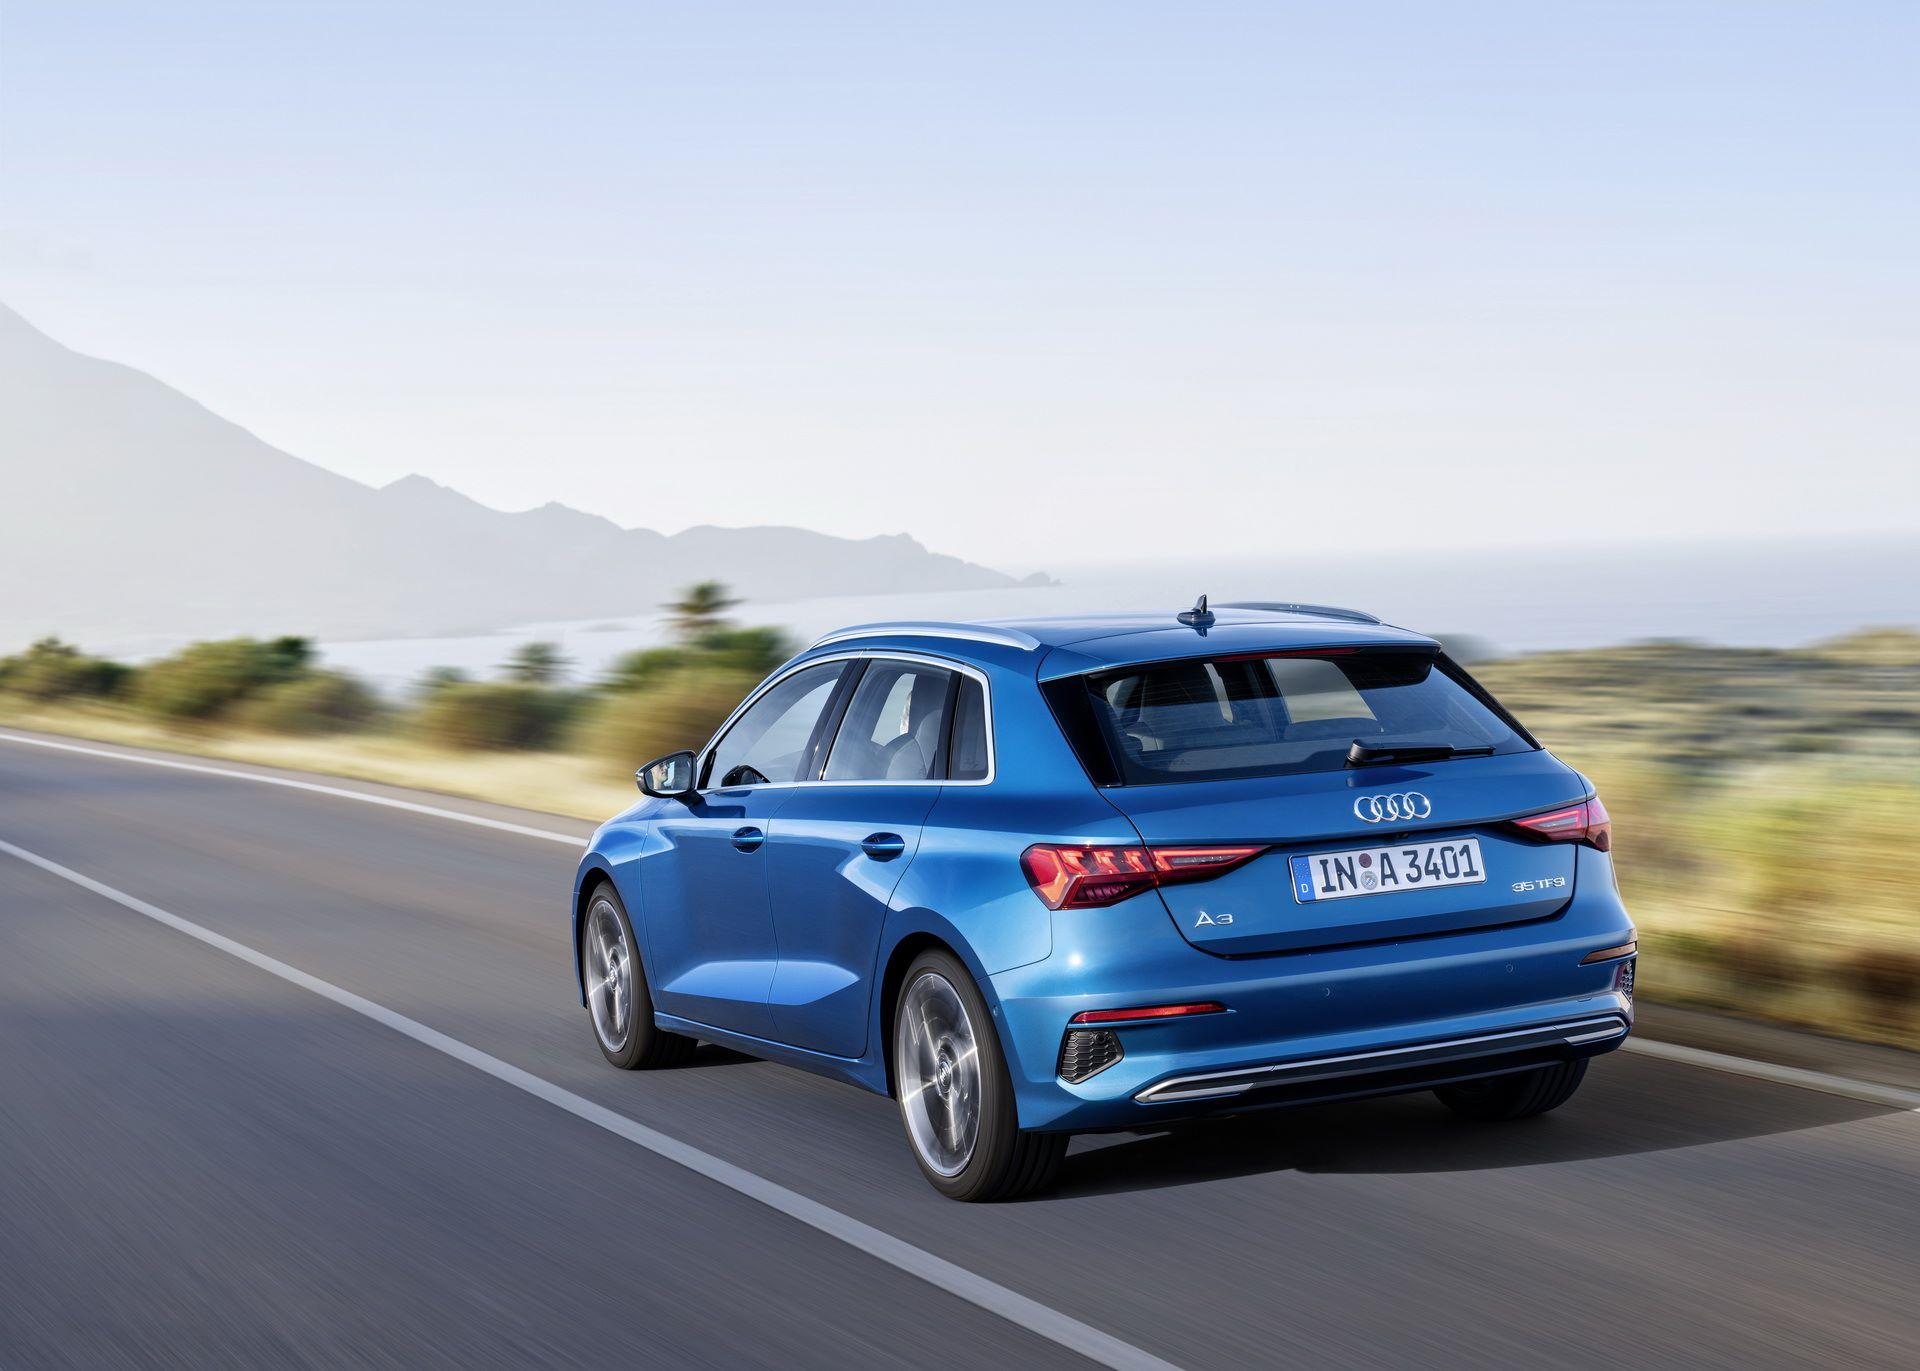 Audi-A3-Sportback-2020-4